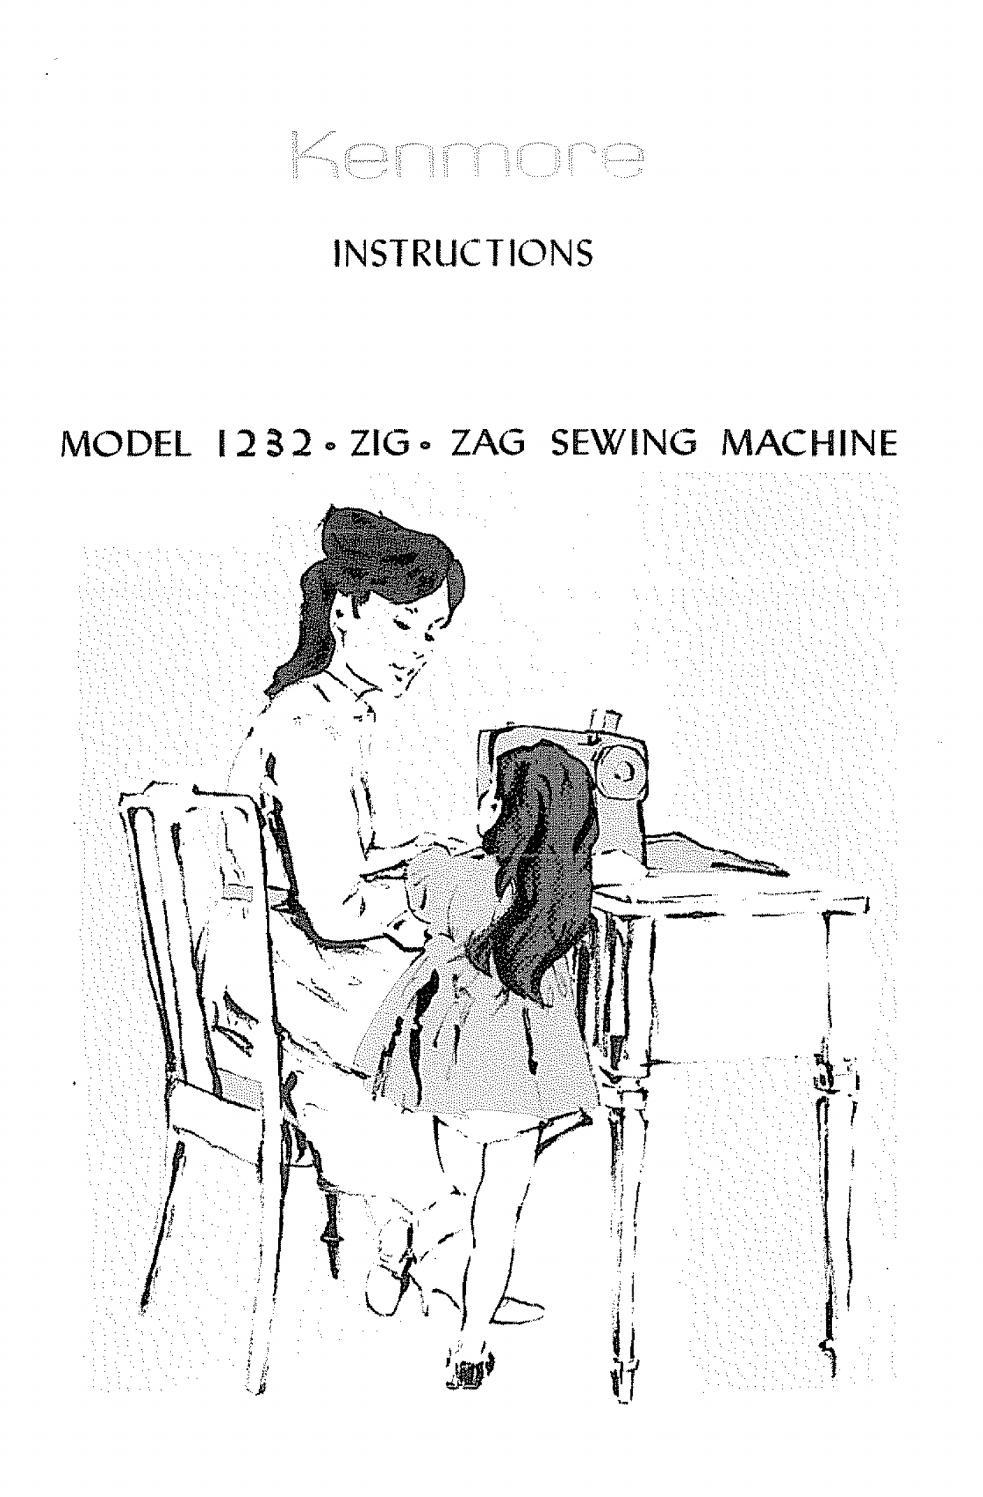 Kenmore 1232 sewing machine user manual by David Mannock